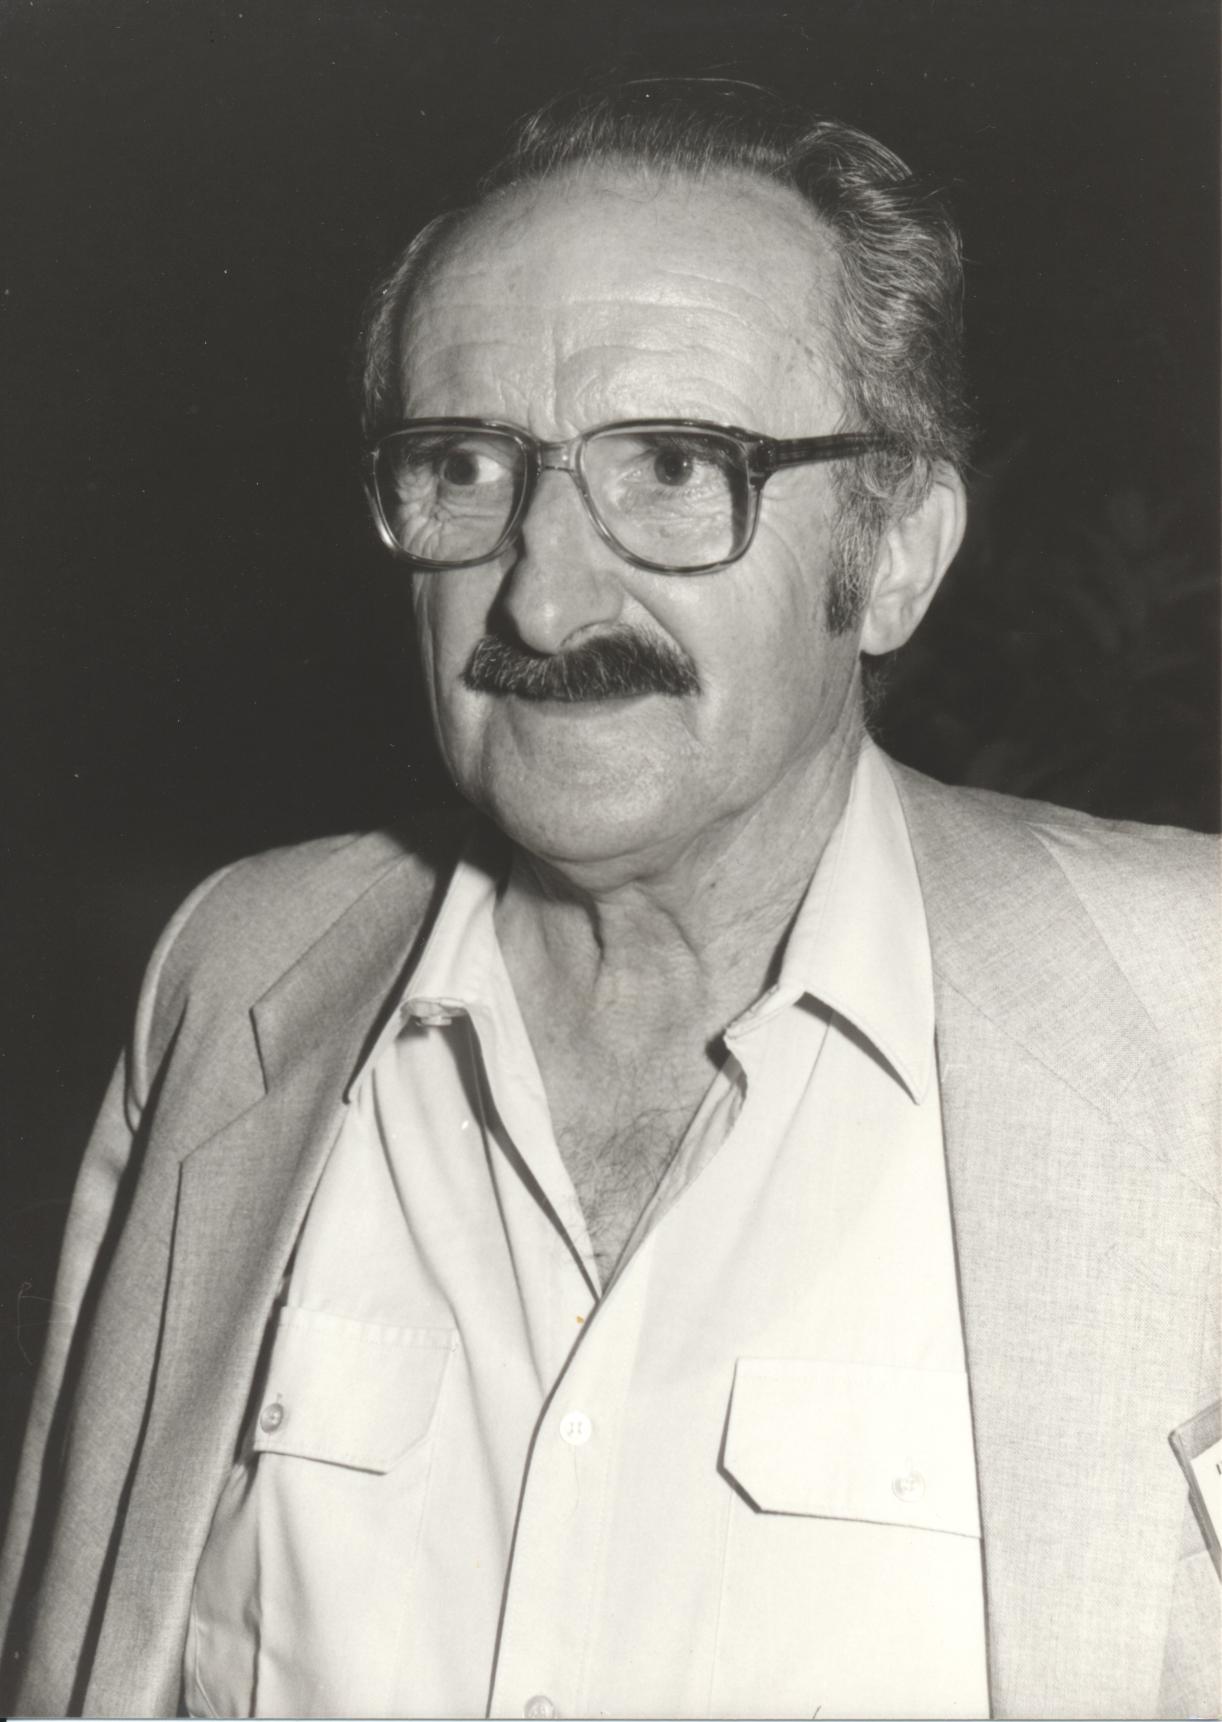 XII. Imago Mundi-Kongress 1989, Innsbruck, Rudolf Passian